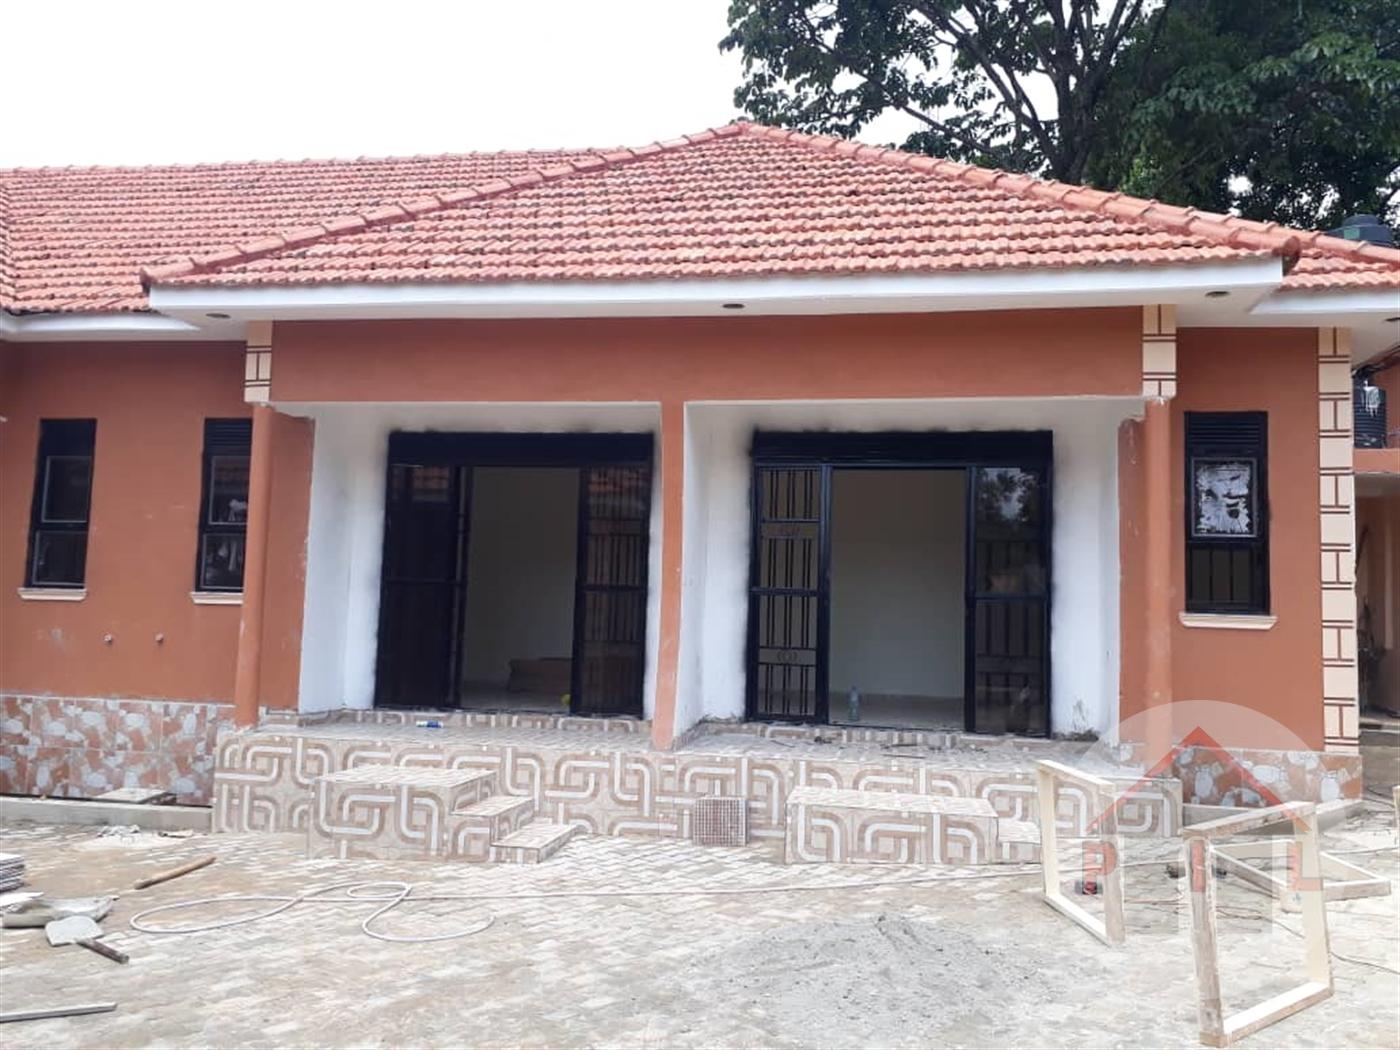 Rental units for sale in Munyonyo Kampala